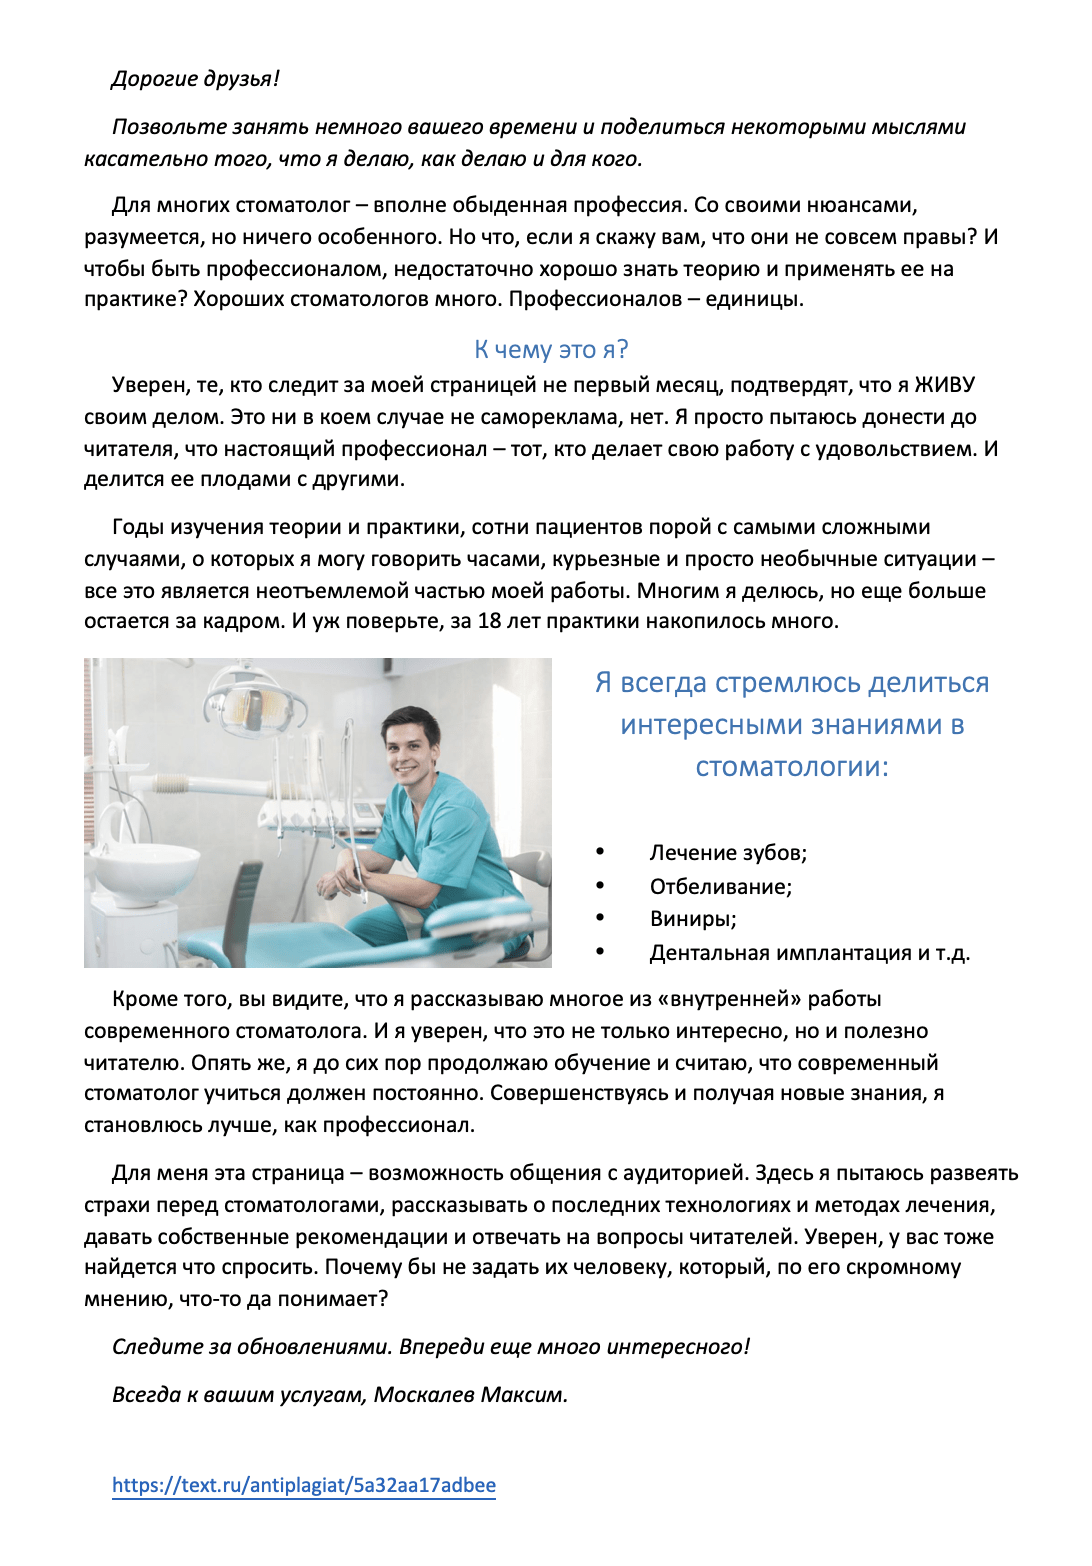 Продающий пост на медицинскую тематику – Пример 78.